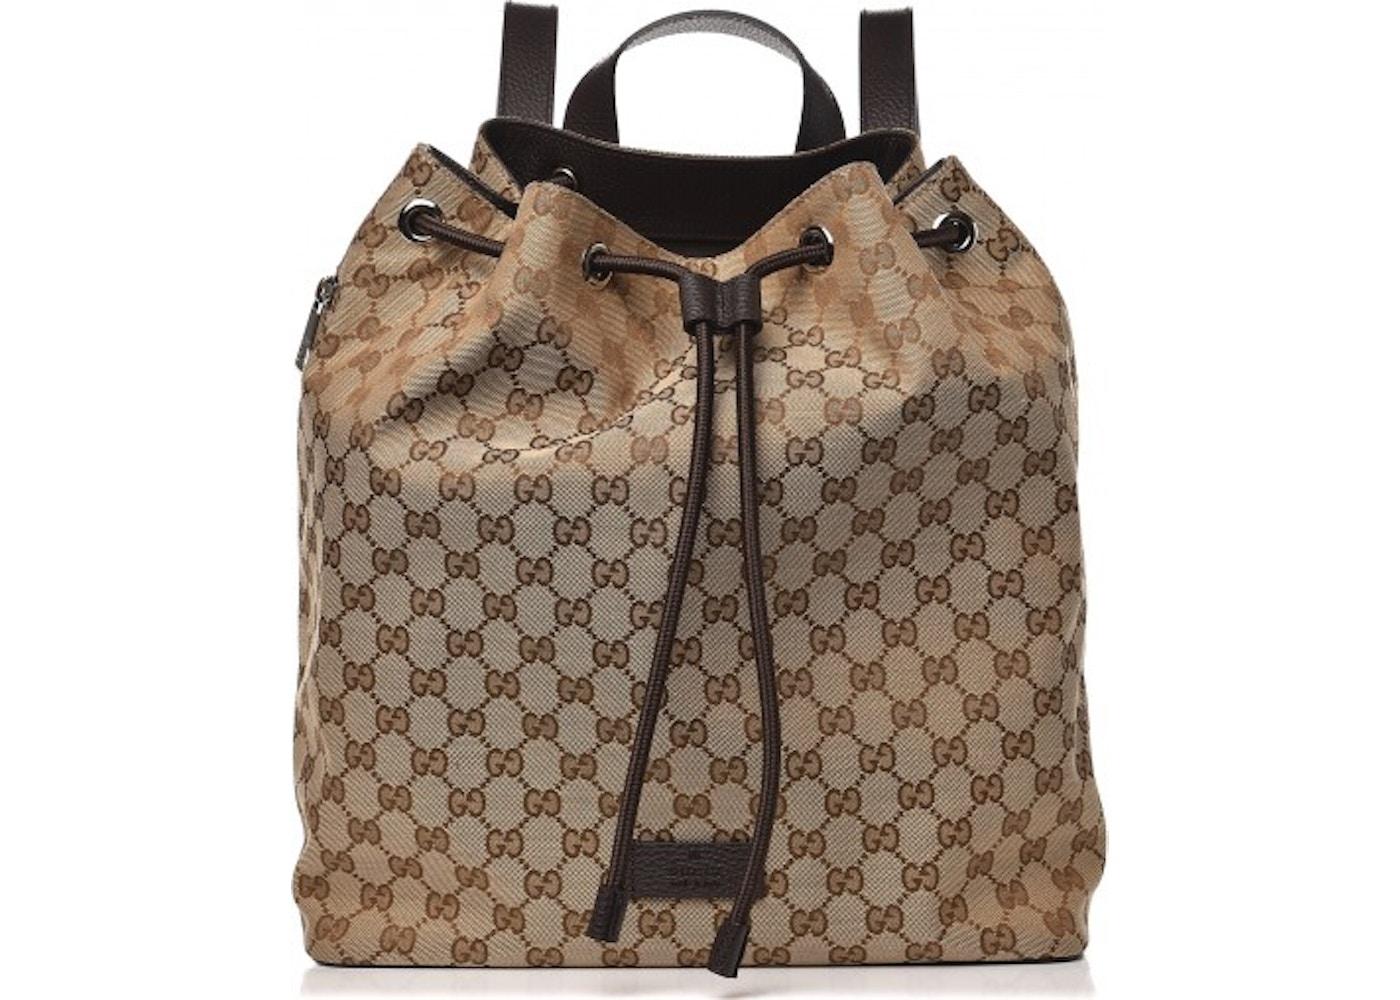 f7042c66b3b Gucci Drawstring Backpack Monogram GG Beige Brown. Monogram GG Beige Brown